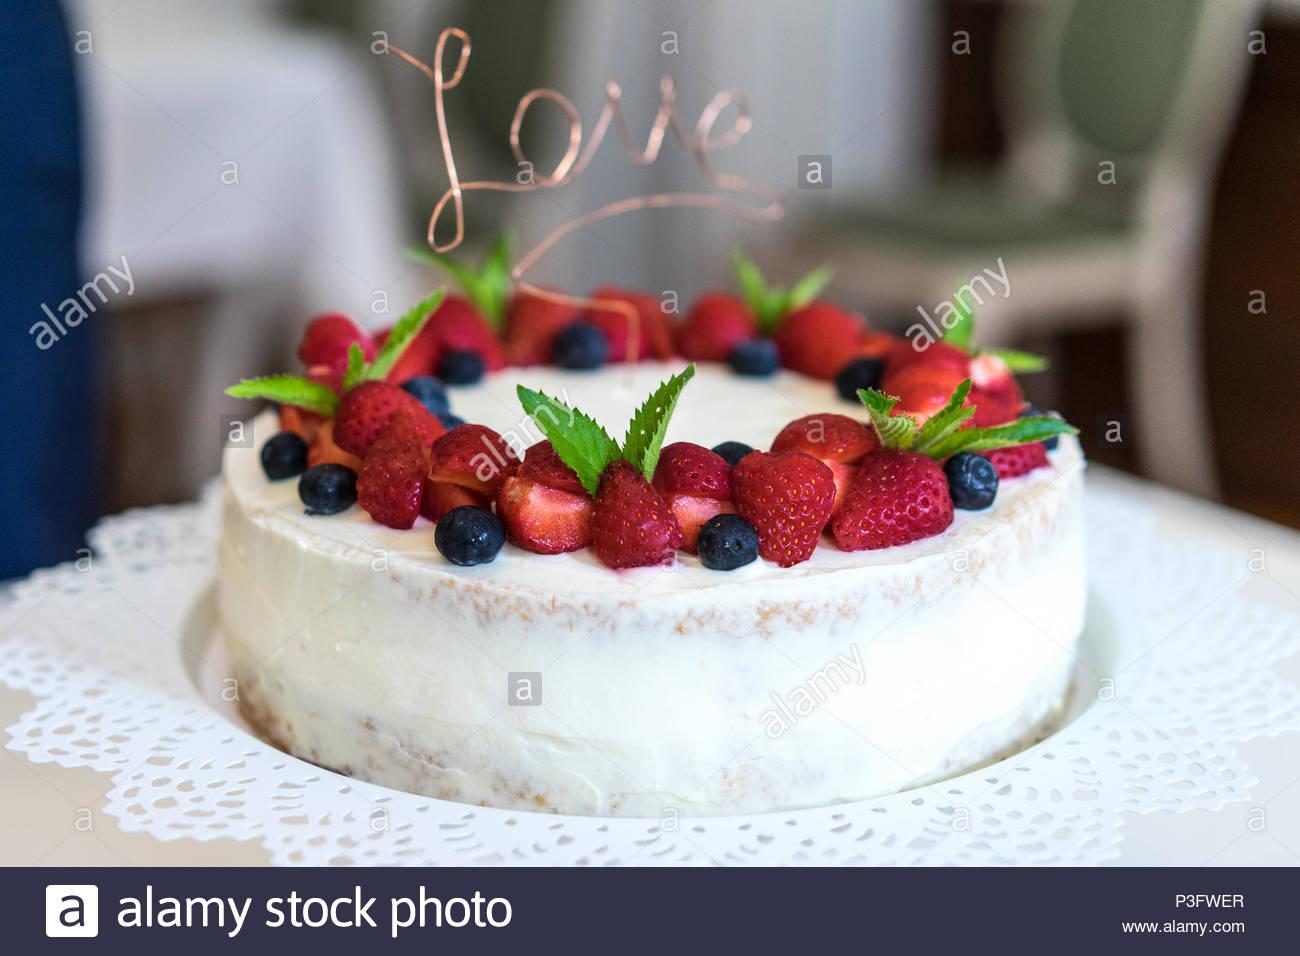 Wedding Cake with Strawberrys and Blueberrys - Stock Image